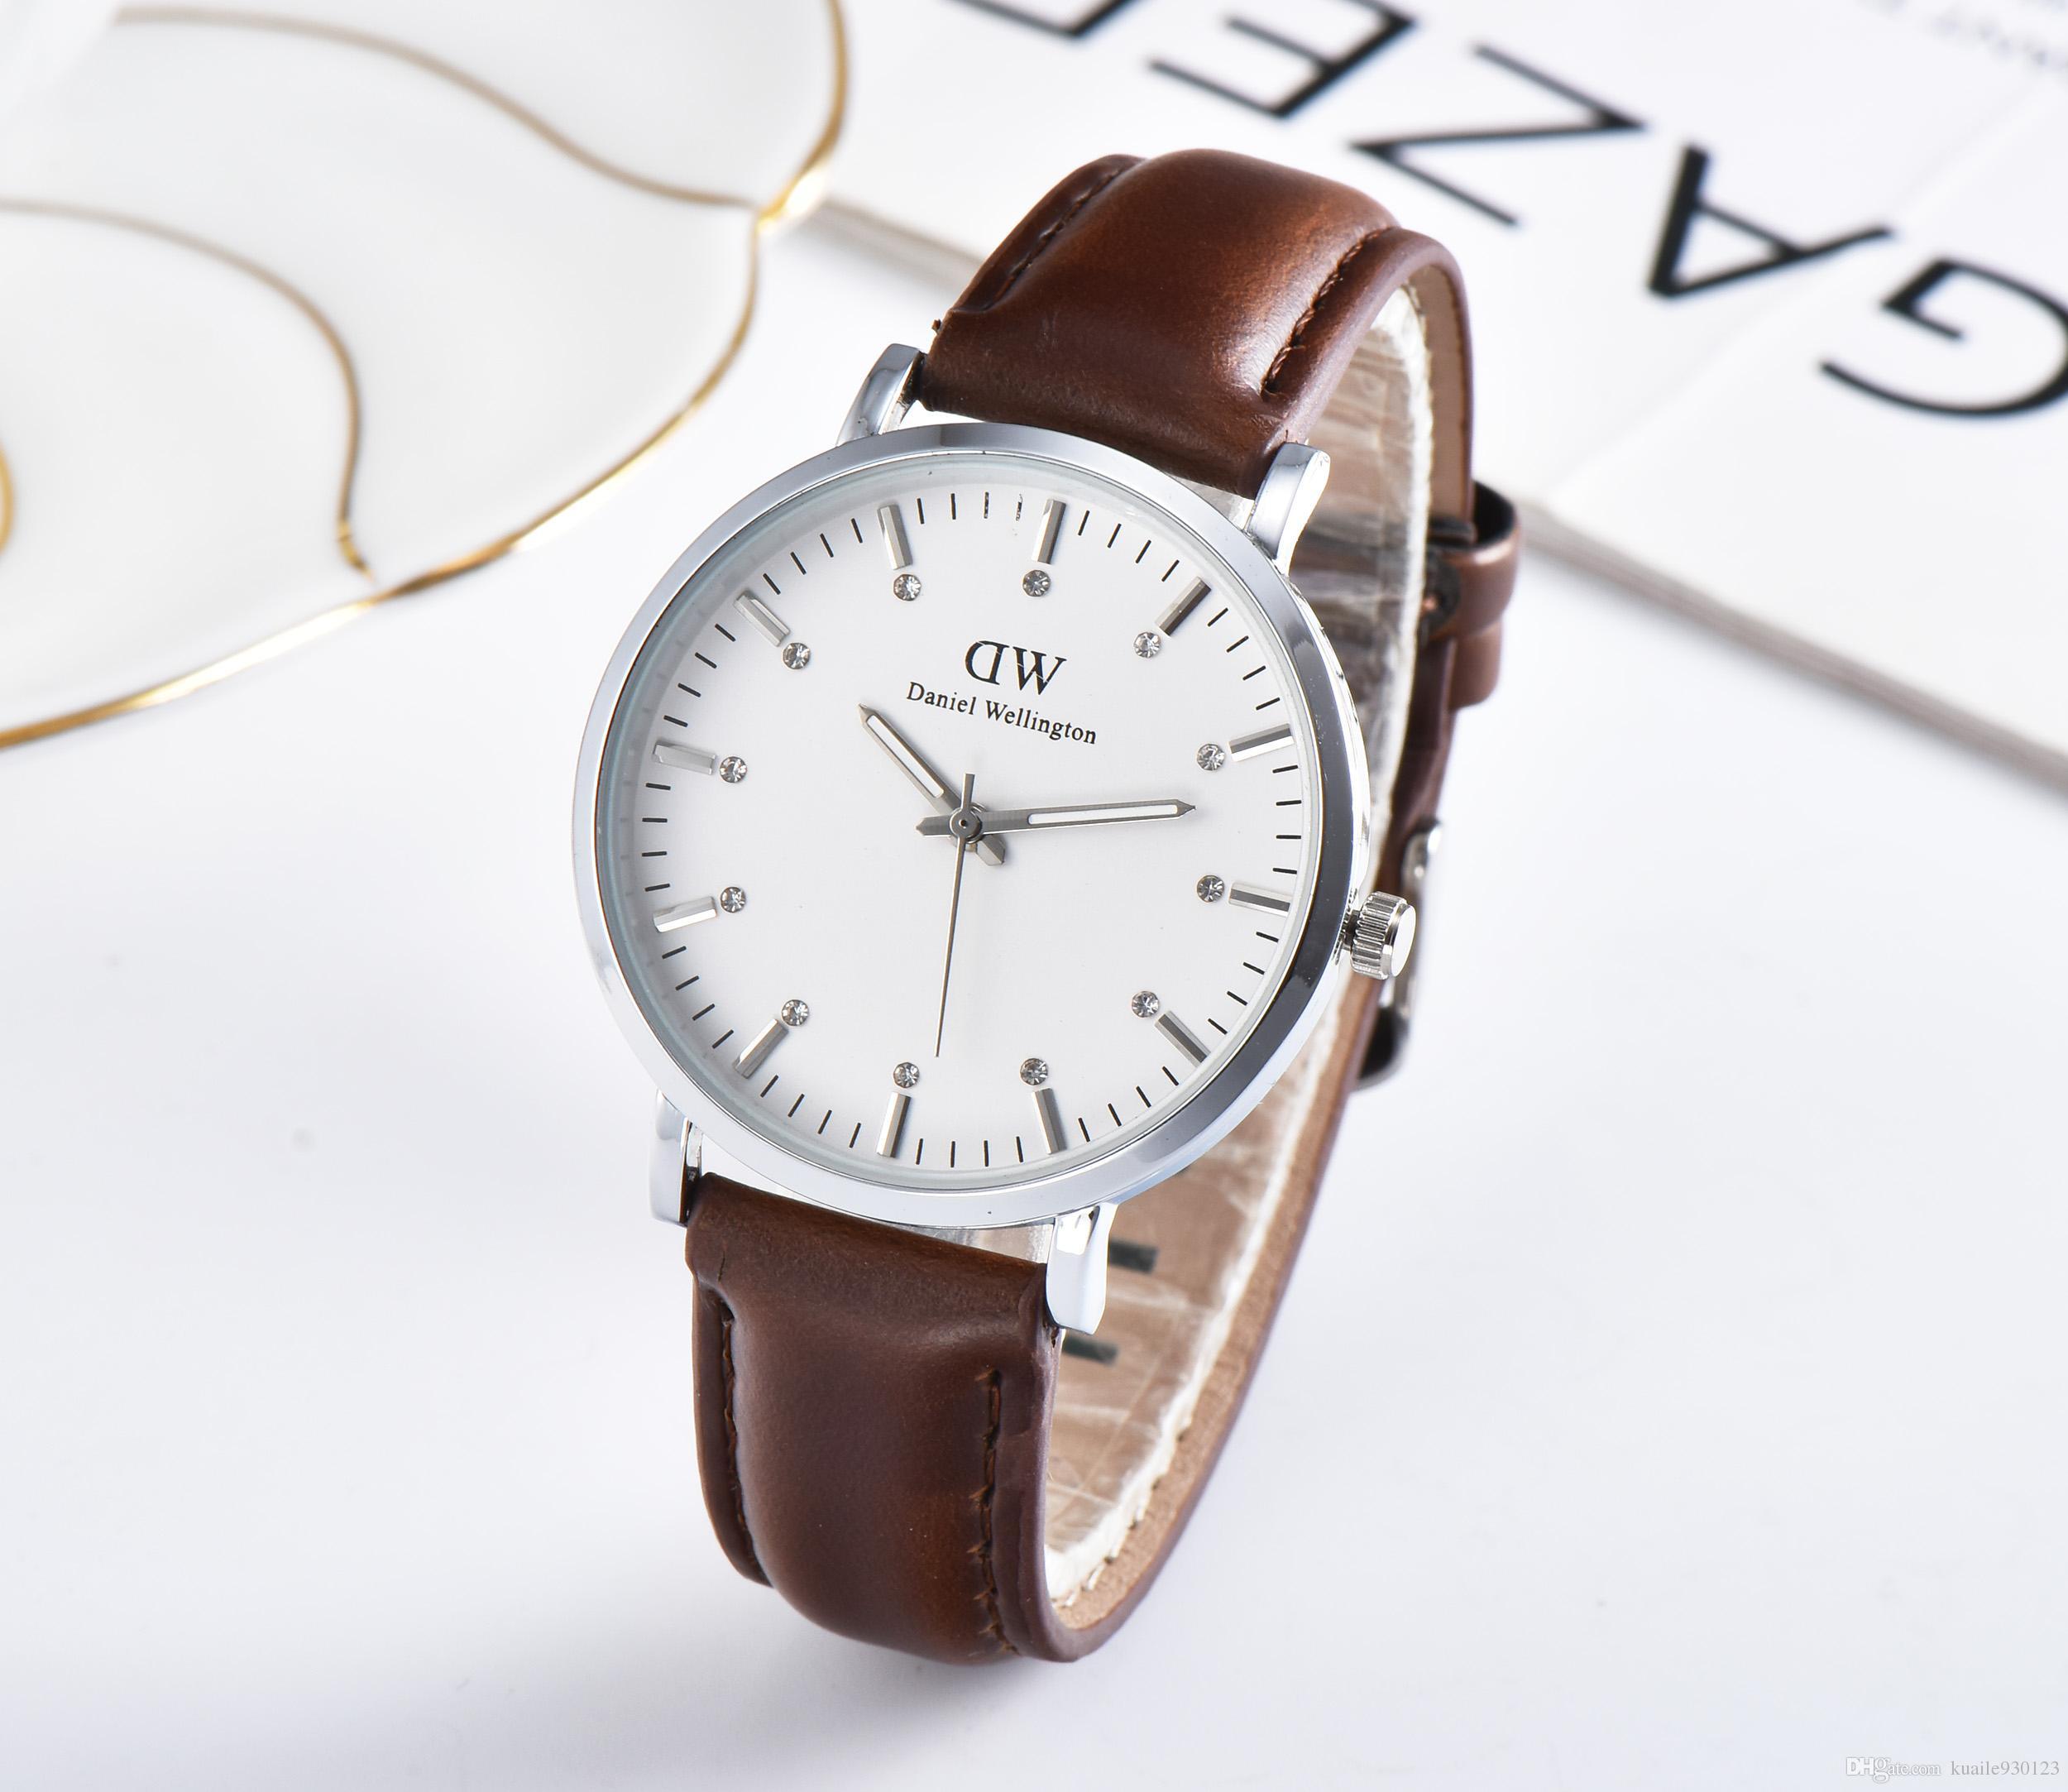 67bbd5a1bb4a5 AAA Daniel Wellington Watches Top Luxury Brand Dw Watch Couples Watch Men  Women Fashion Casual Leather Watch DW Diamond Watches 24 Hour Wristwatch  Watch ...